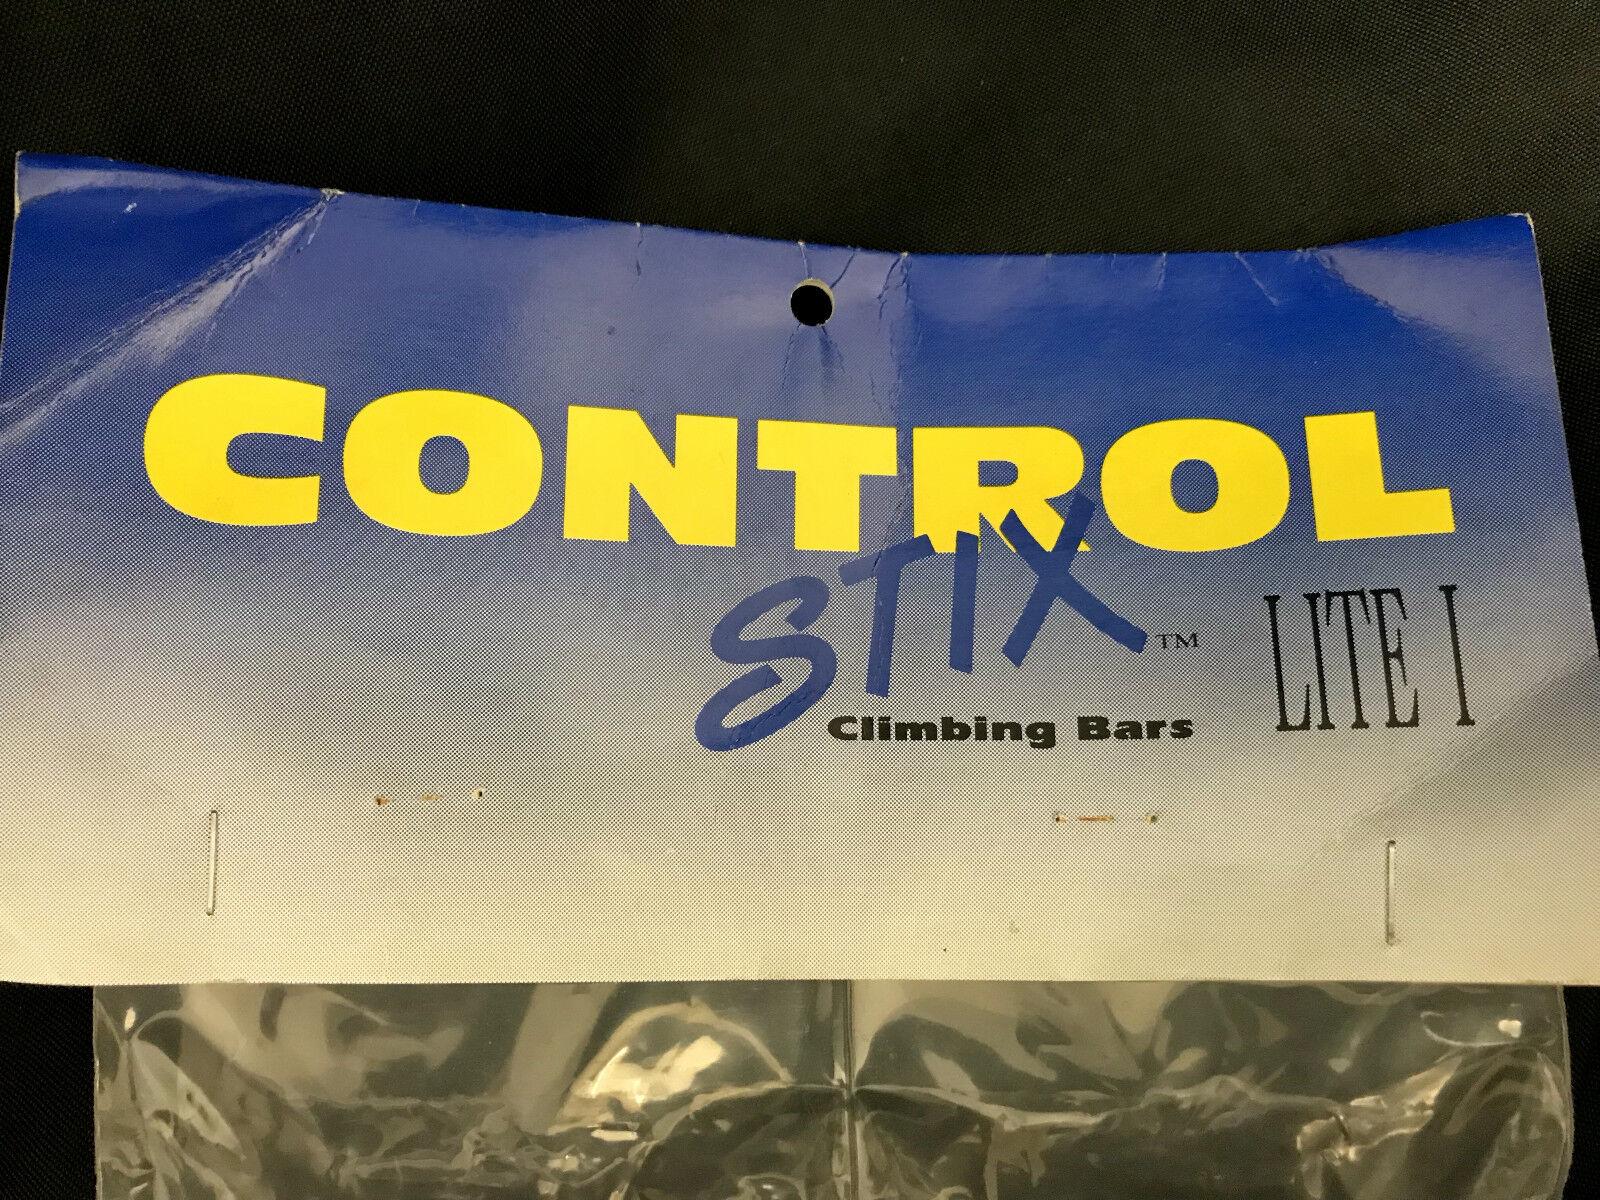 Vintage oldschool oldschool oldschool NOS Controltech bar ends control STIX Morado orig.packed LITE1 c70cbe